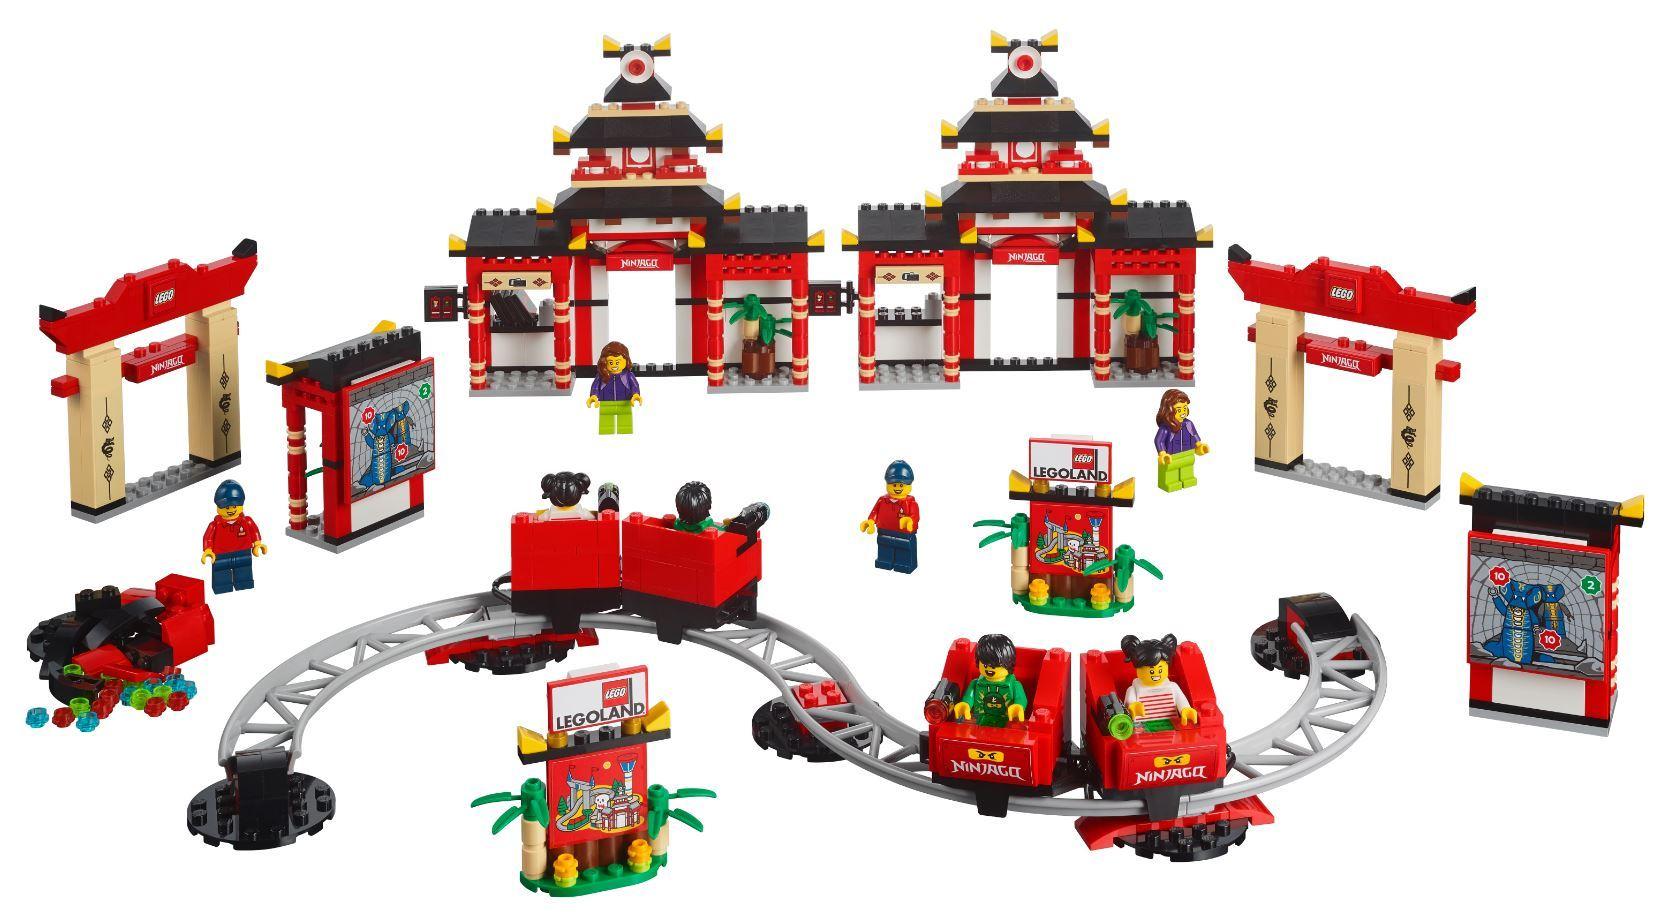 lego-legoland-40429-ninjago-world-2020-2 zusammengebaut.com